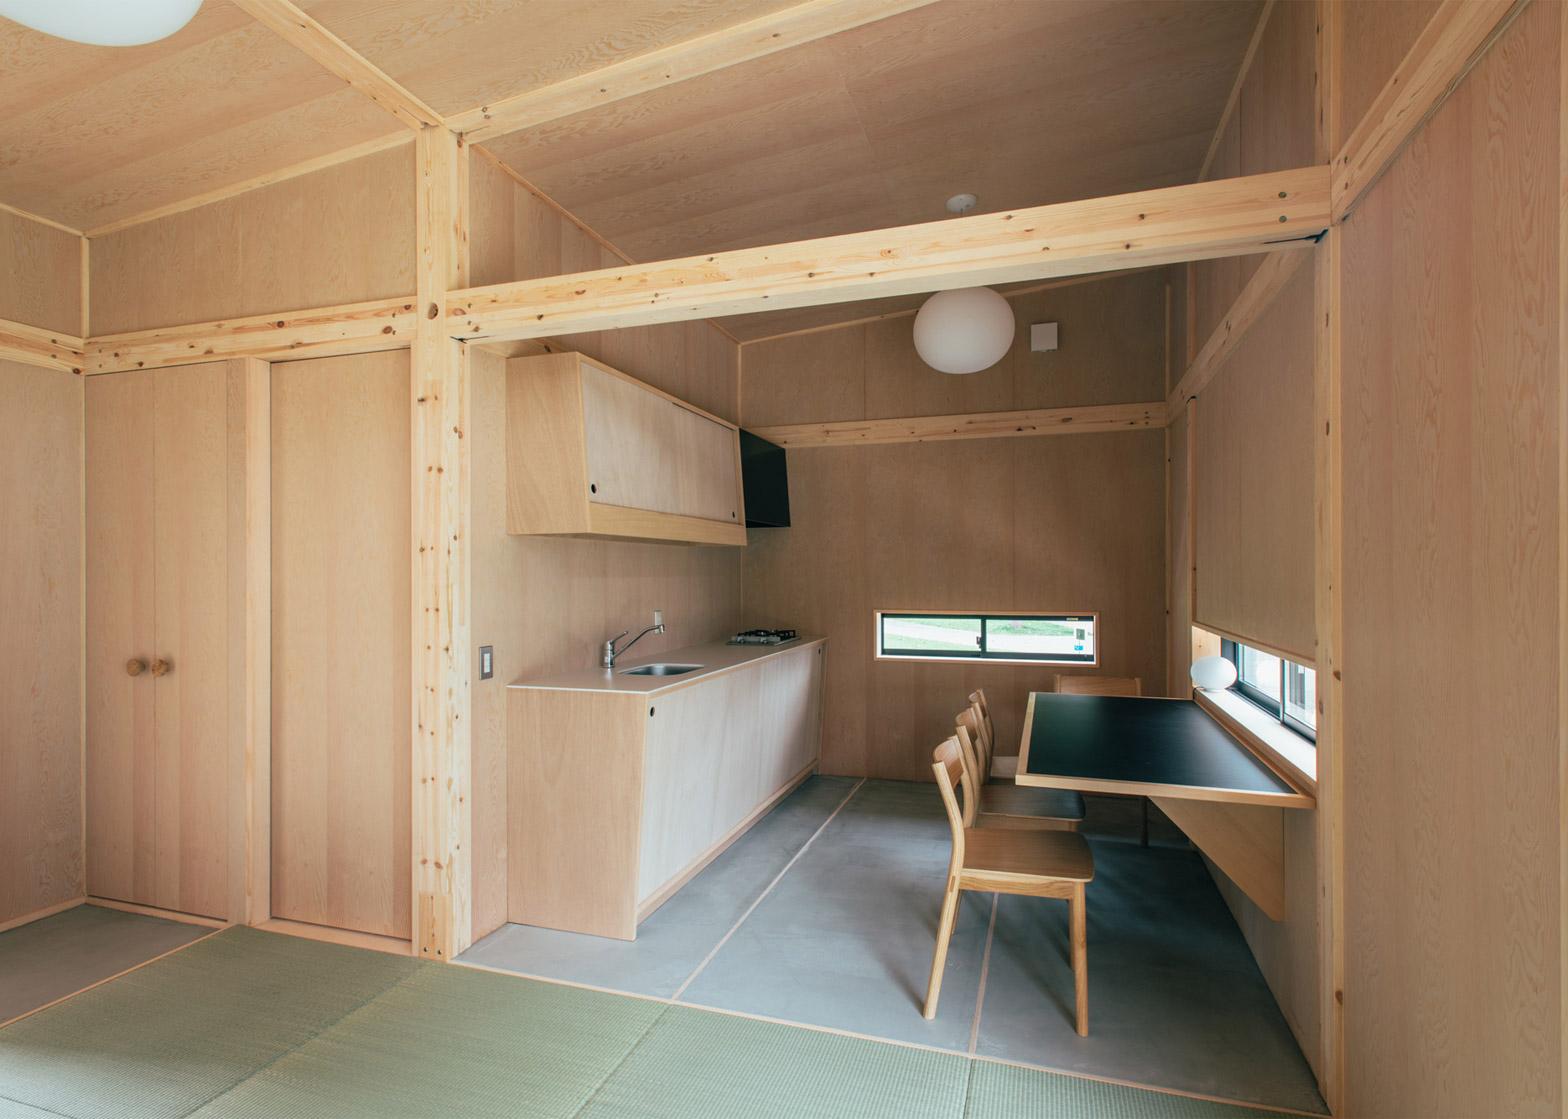 Muji-huts_Jasper-Morrison_dezeen_1568_2.jpg